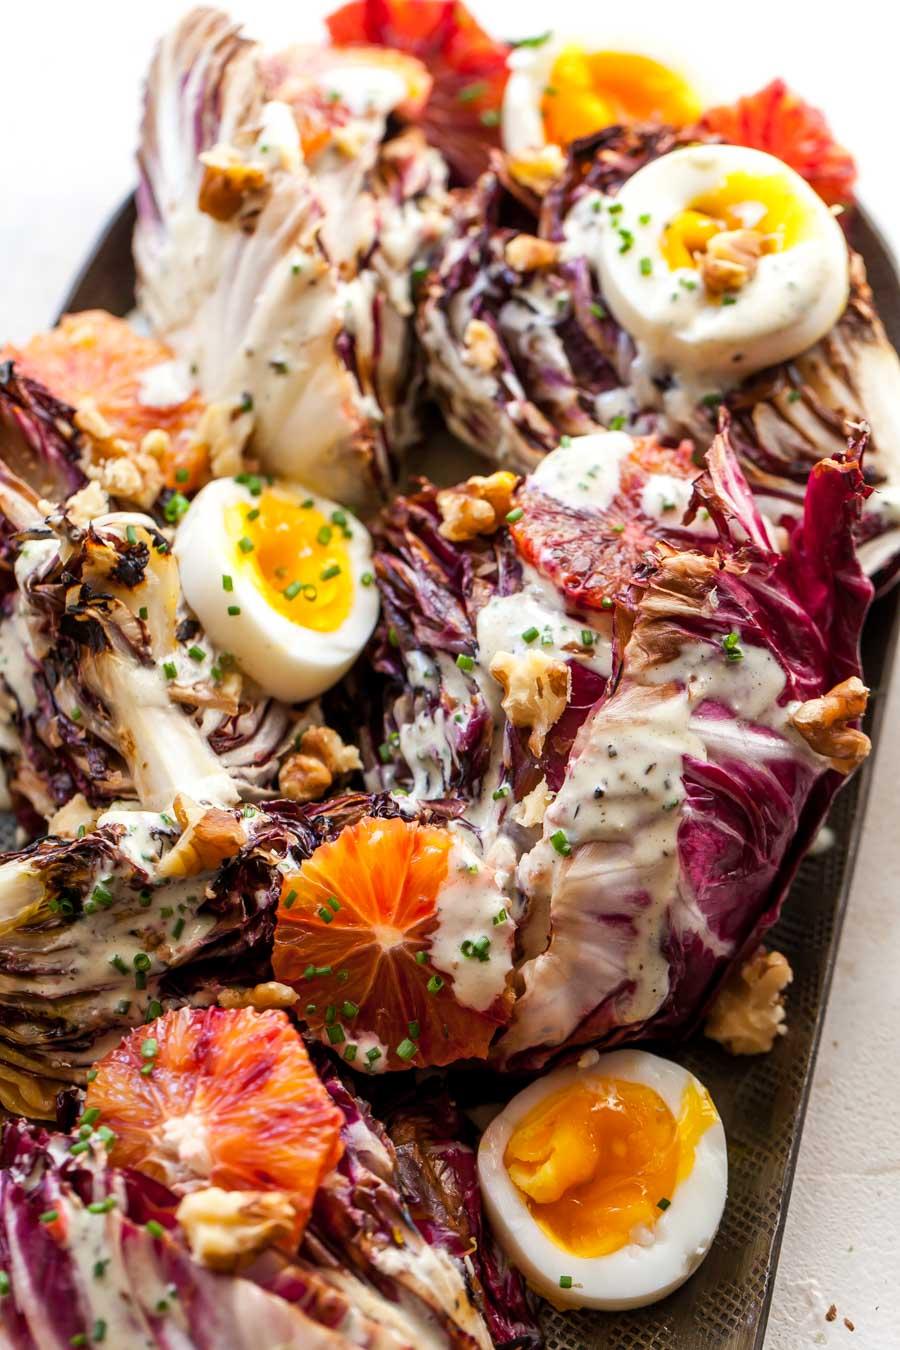 Grilled Salad with Jammy Eggs, Walnuts, and Creamy Walnut Dressing